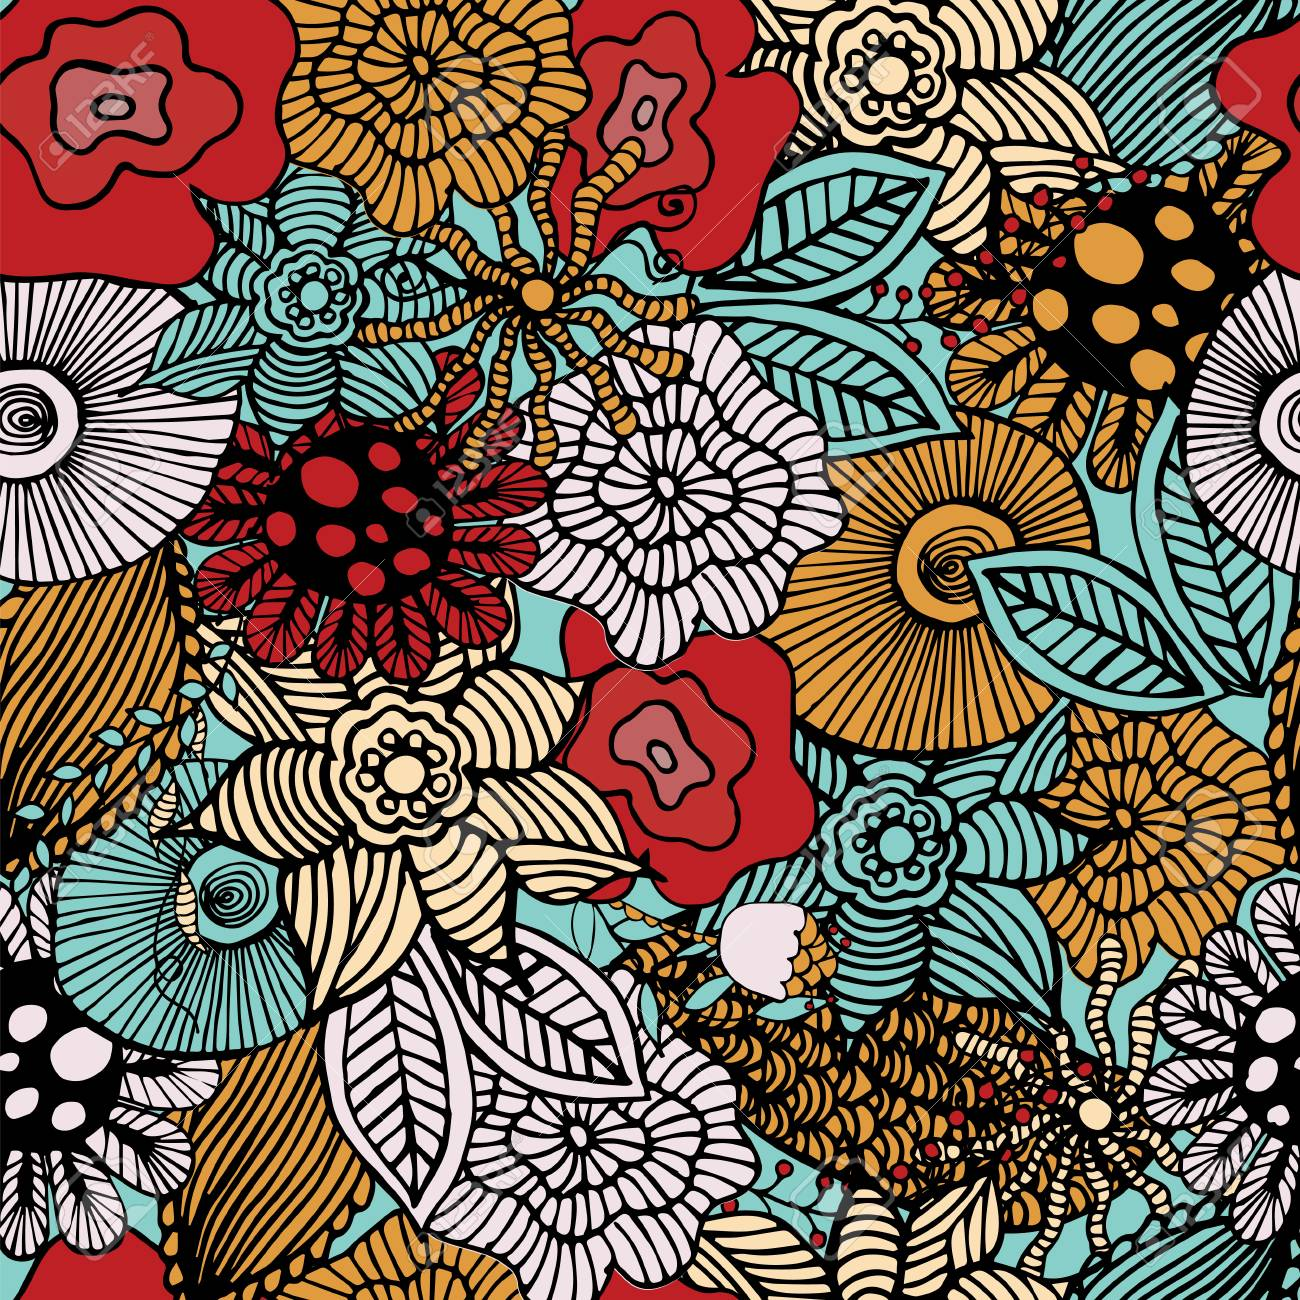 Botanic Texture Detailed Flowers Illustrations Doodle Style